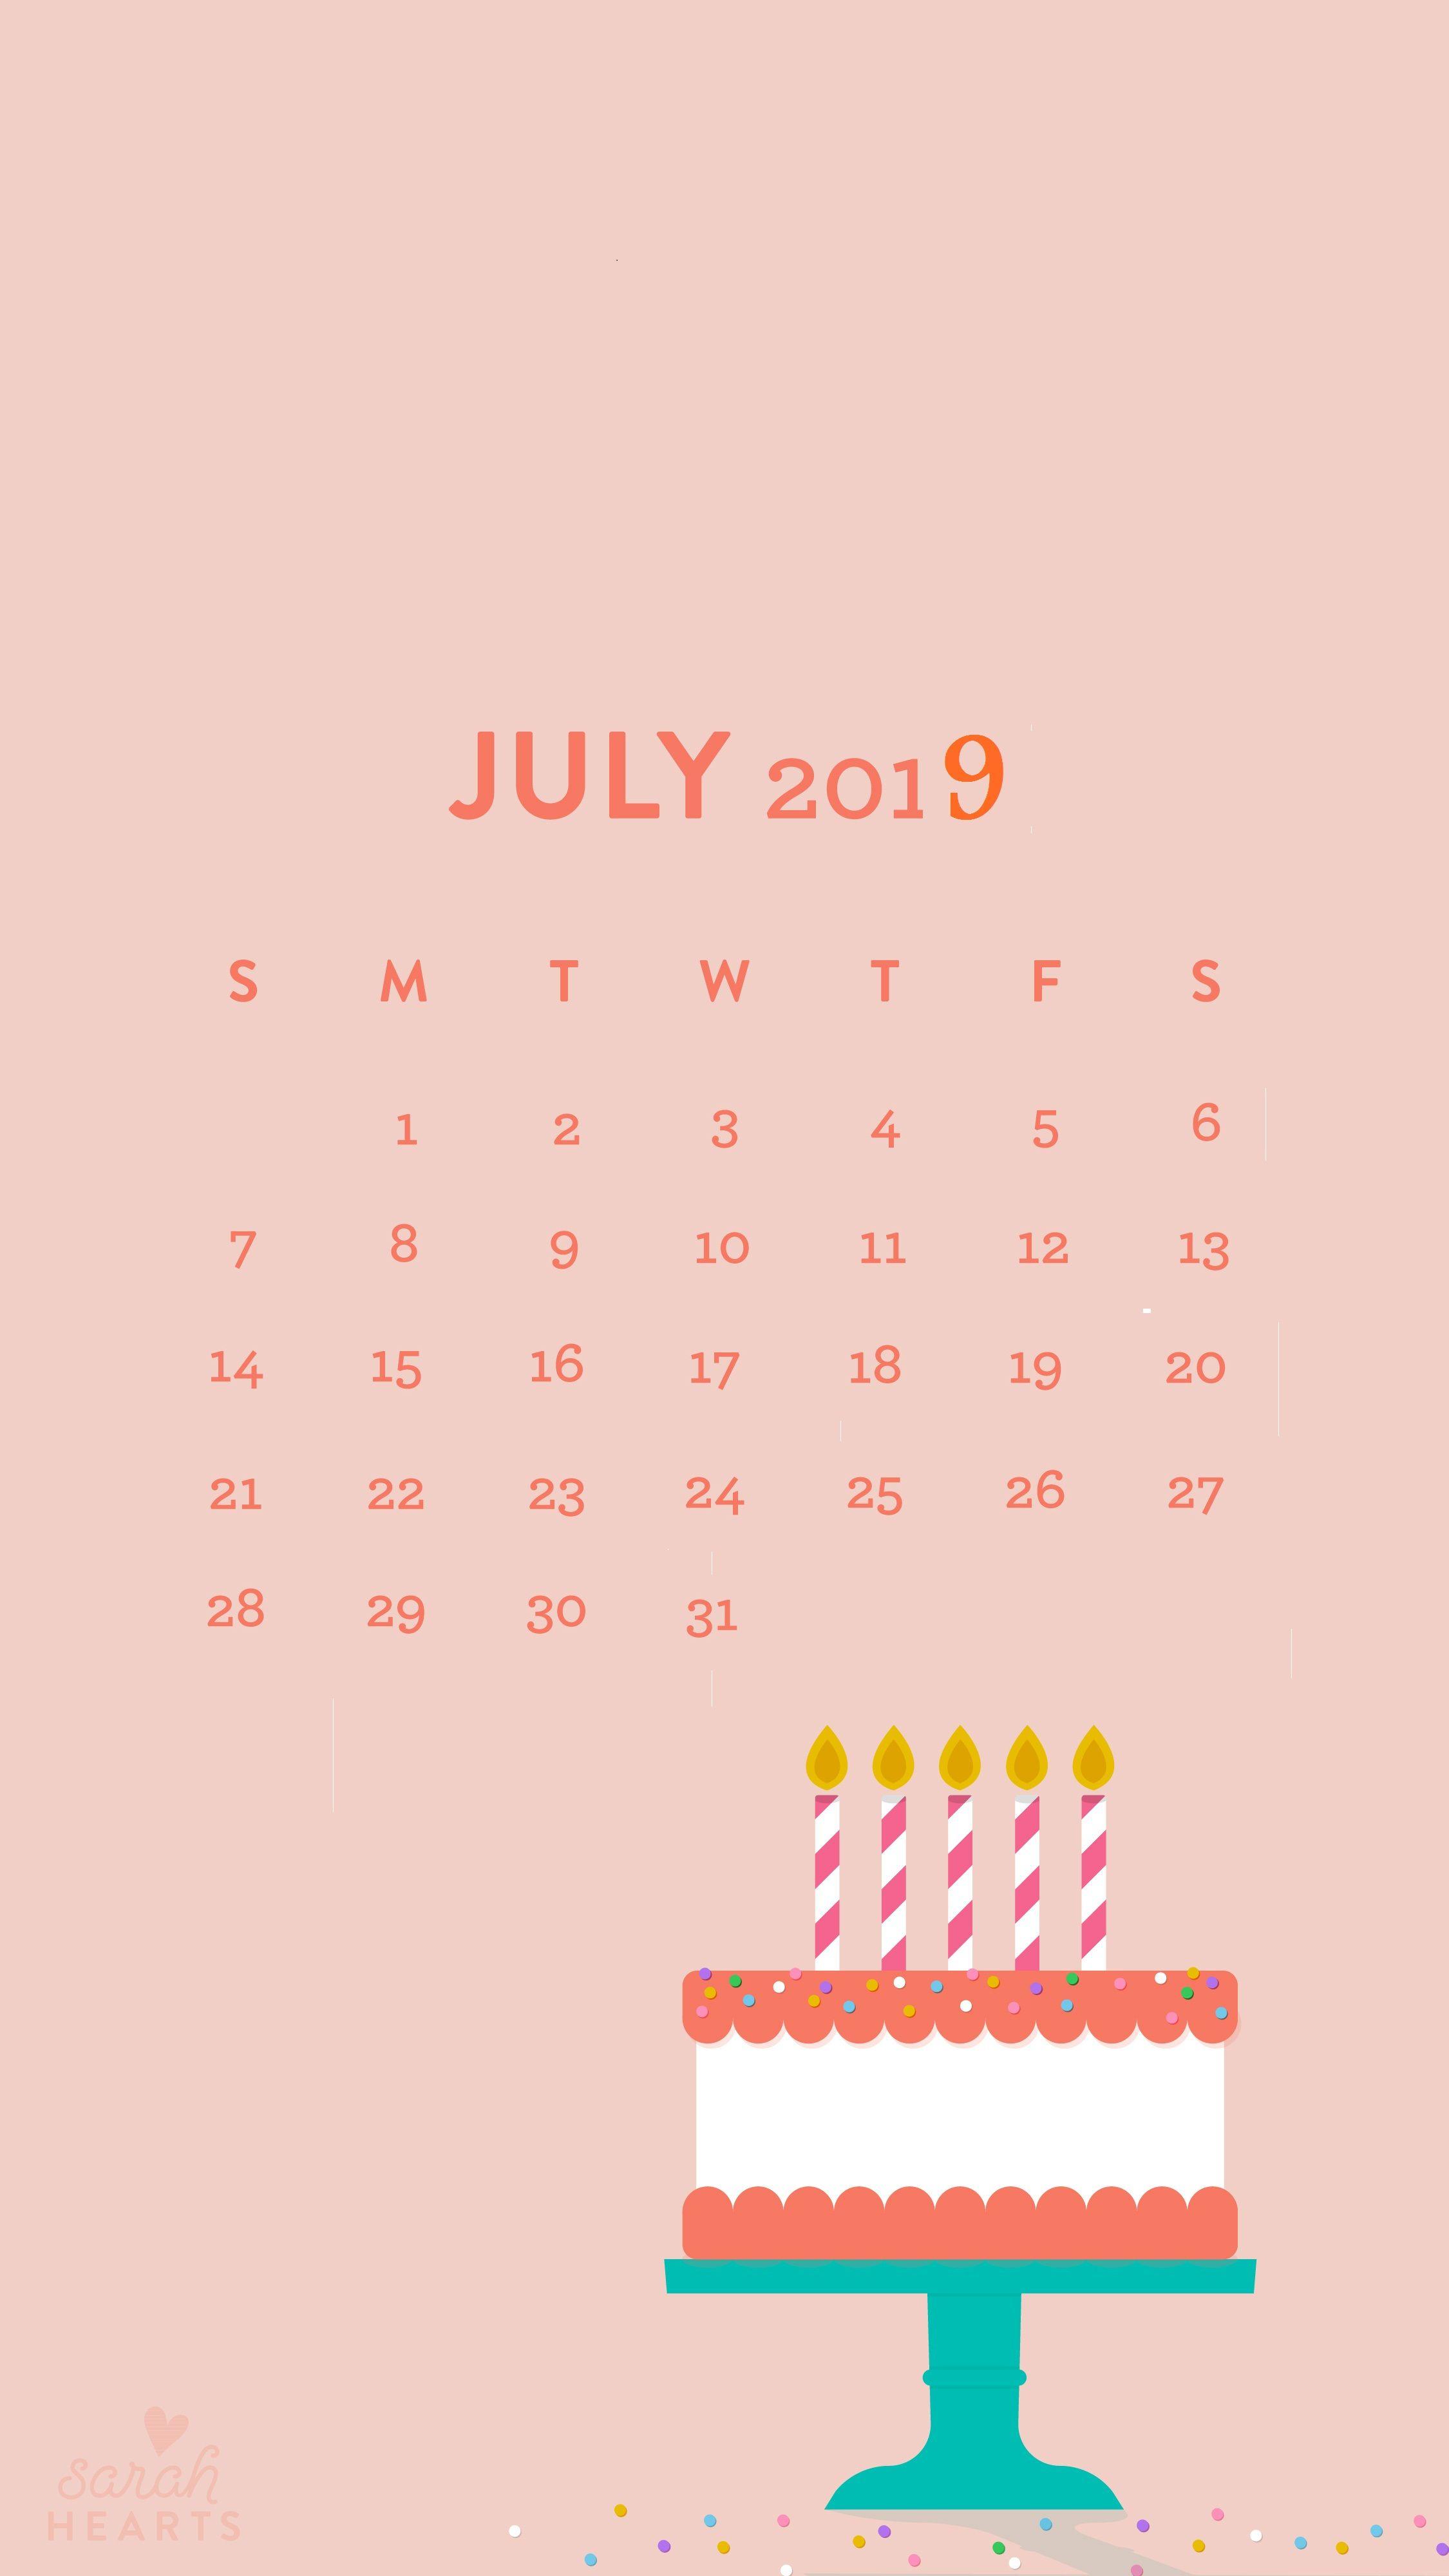 July 2019 Iphone Calendar Wallpaper In 2019 | Calendar